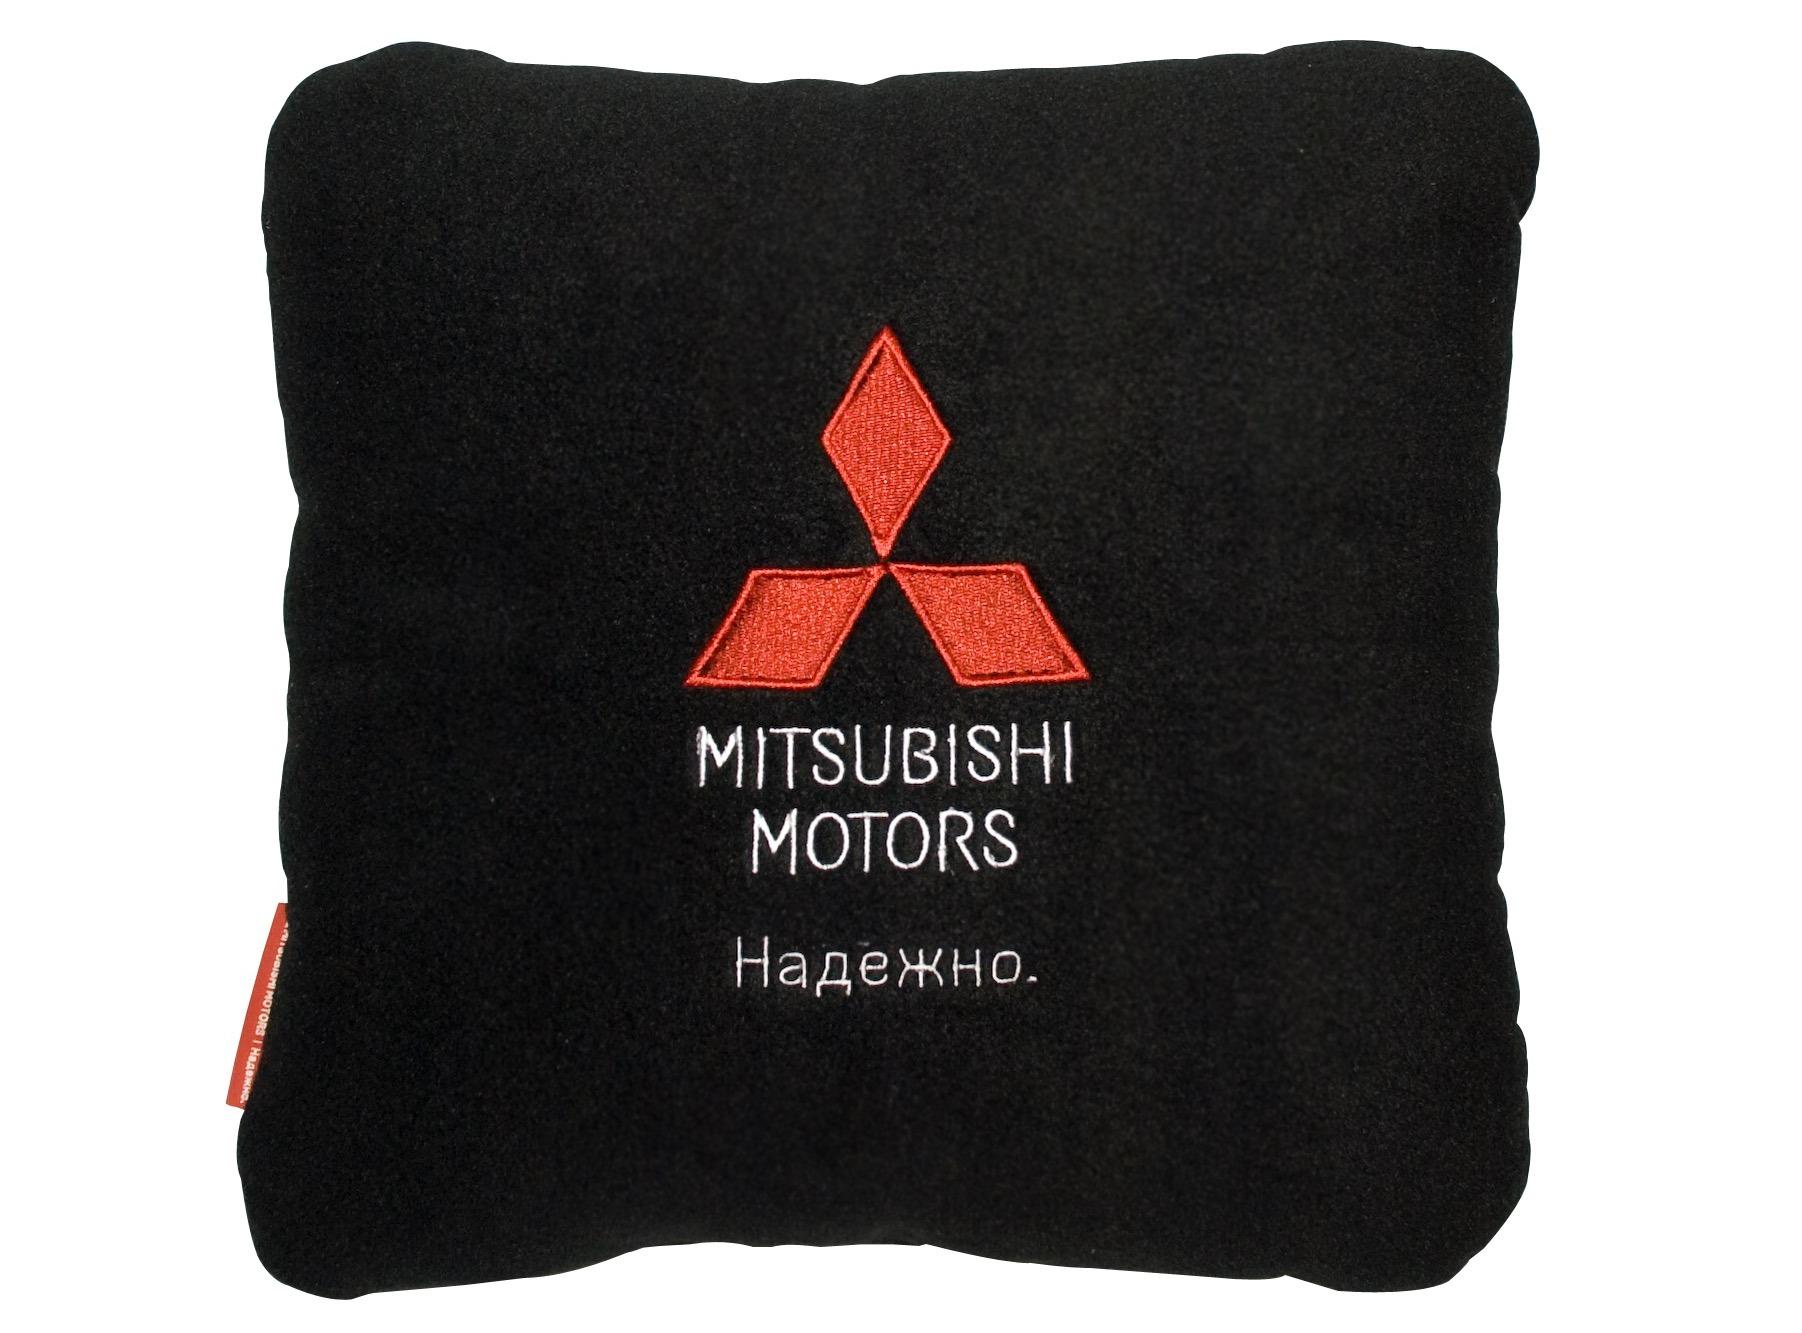 Автомобильная подушка Mitsubishi RU000023 Black